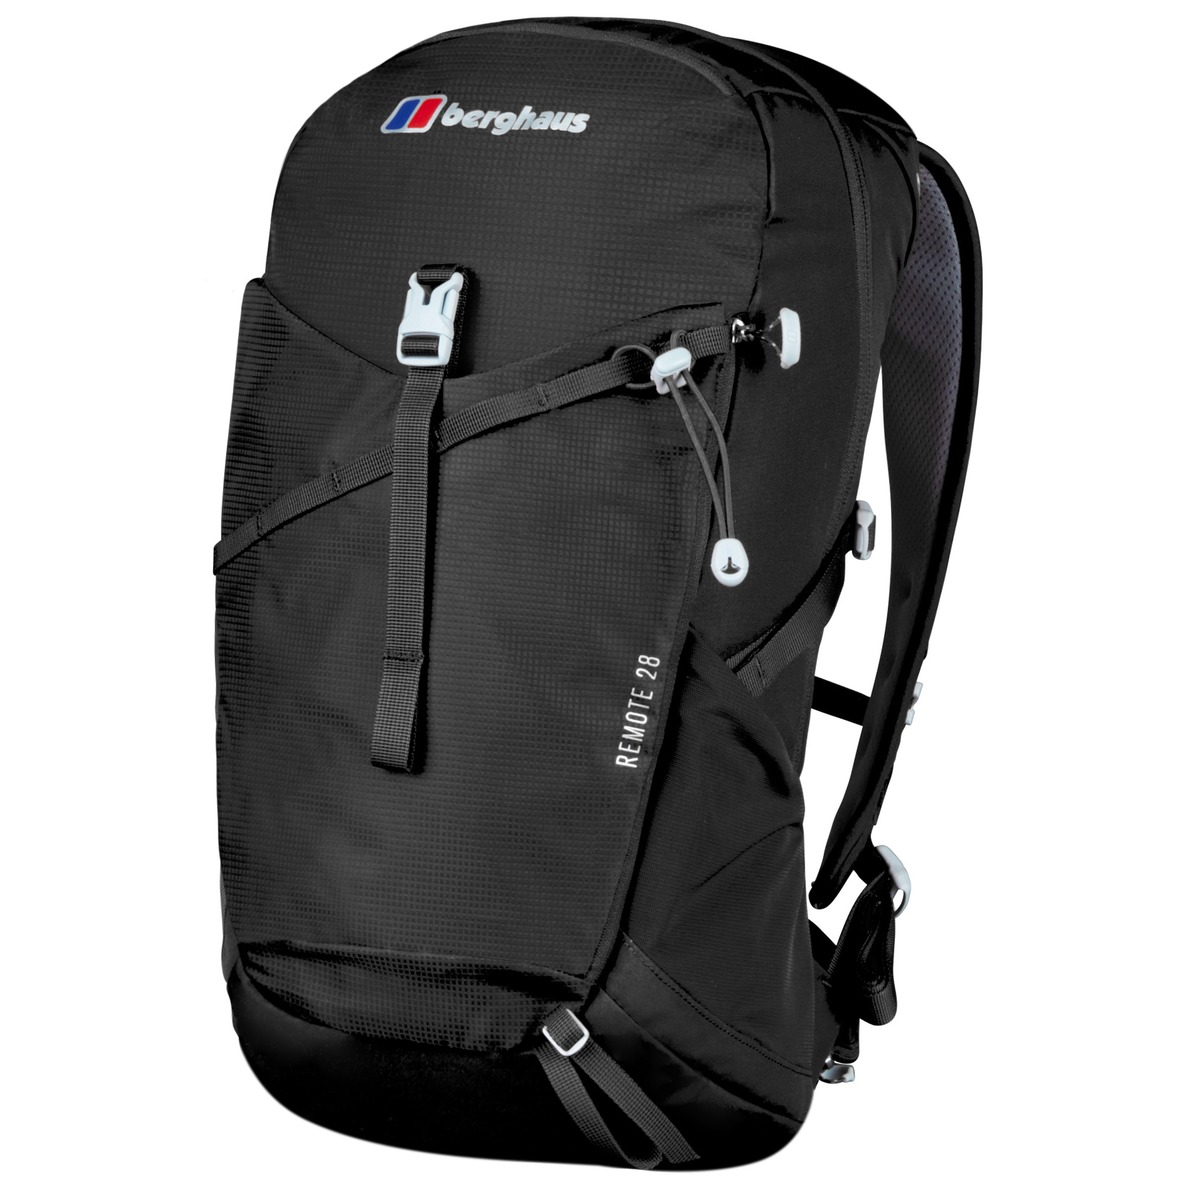 svart berghaus remote 28 rucsac au black ryggsäck 30 liter 2d577526dd23a